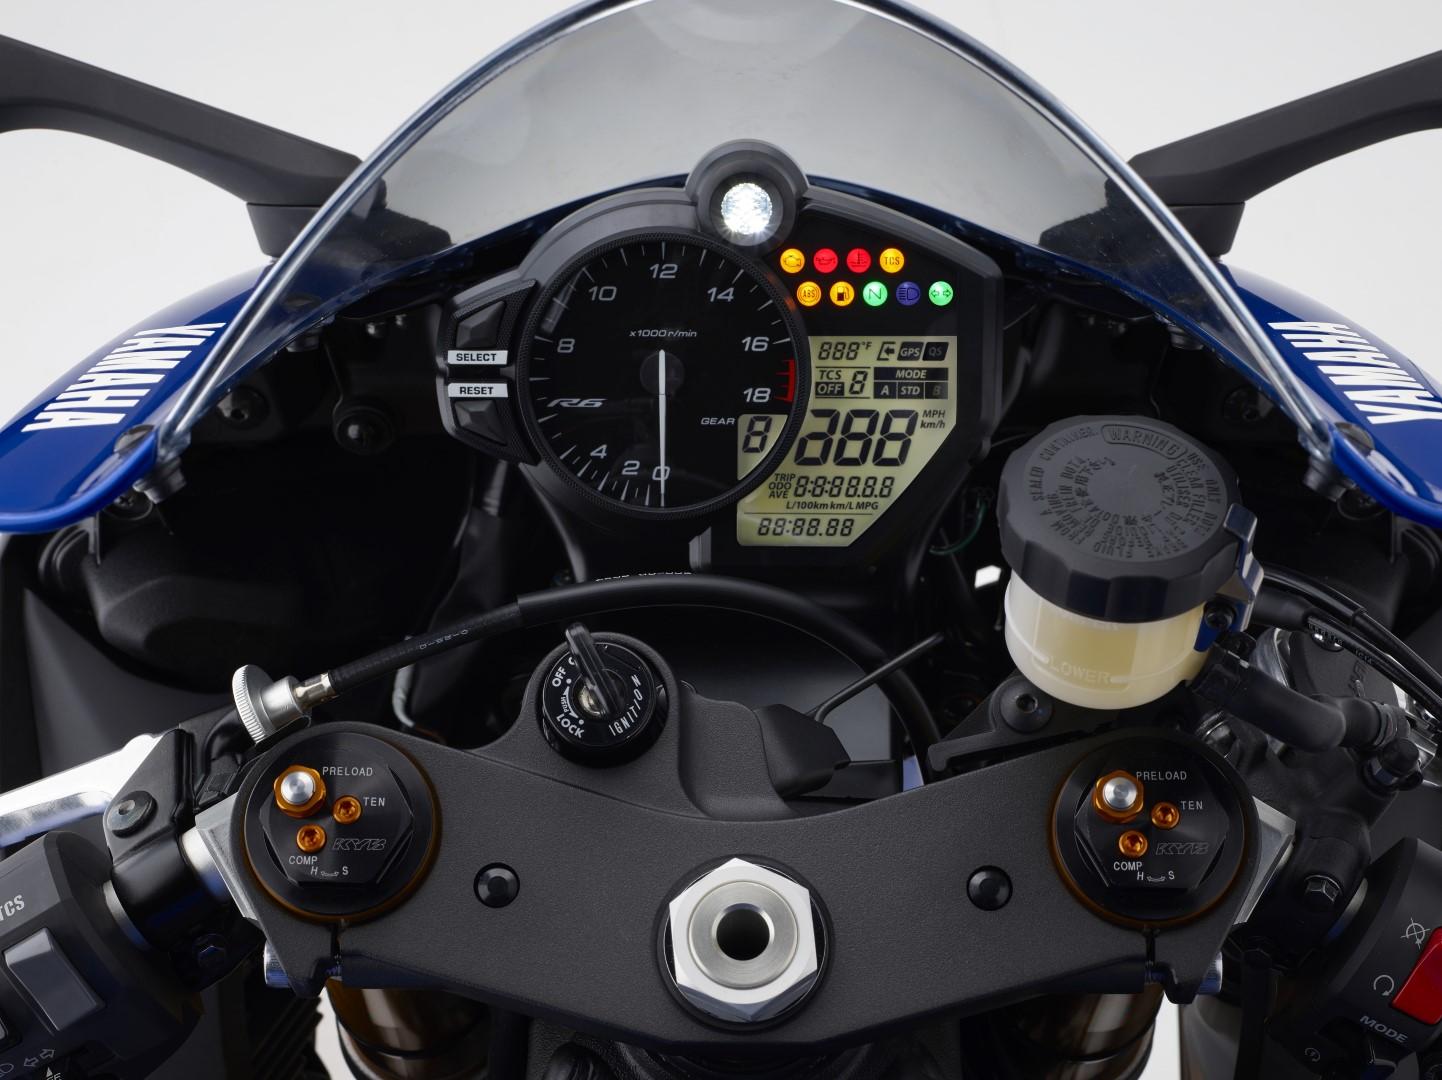 Yamaha YZF-R6 2017, la supersport japonesa Euro4